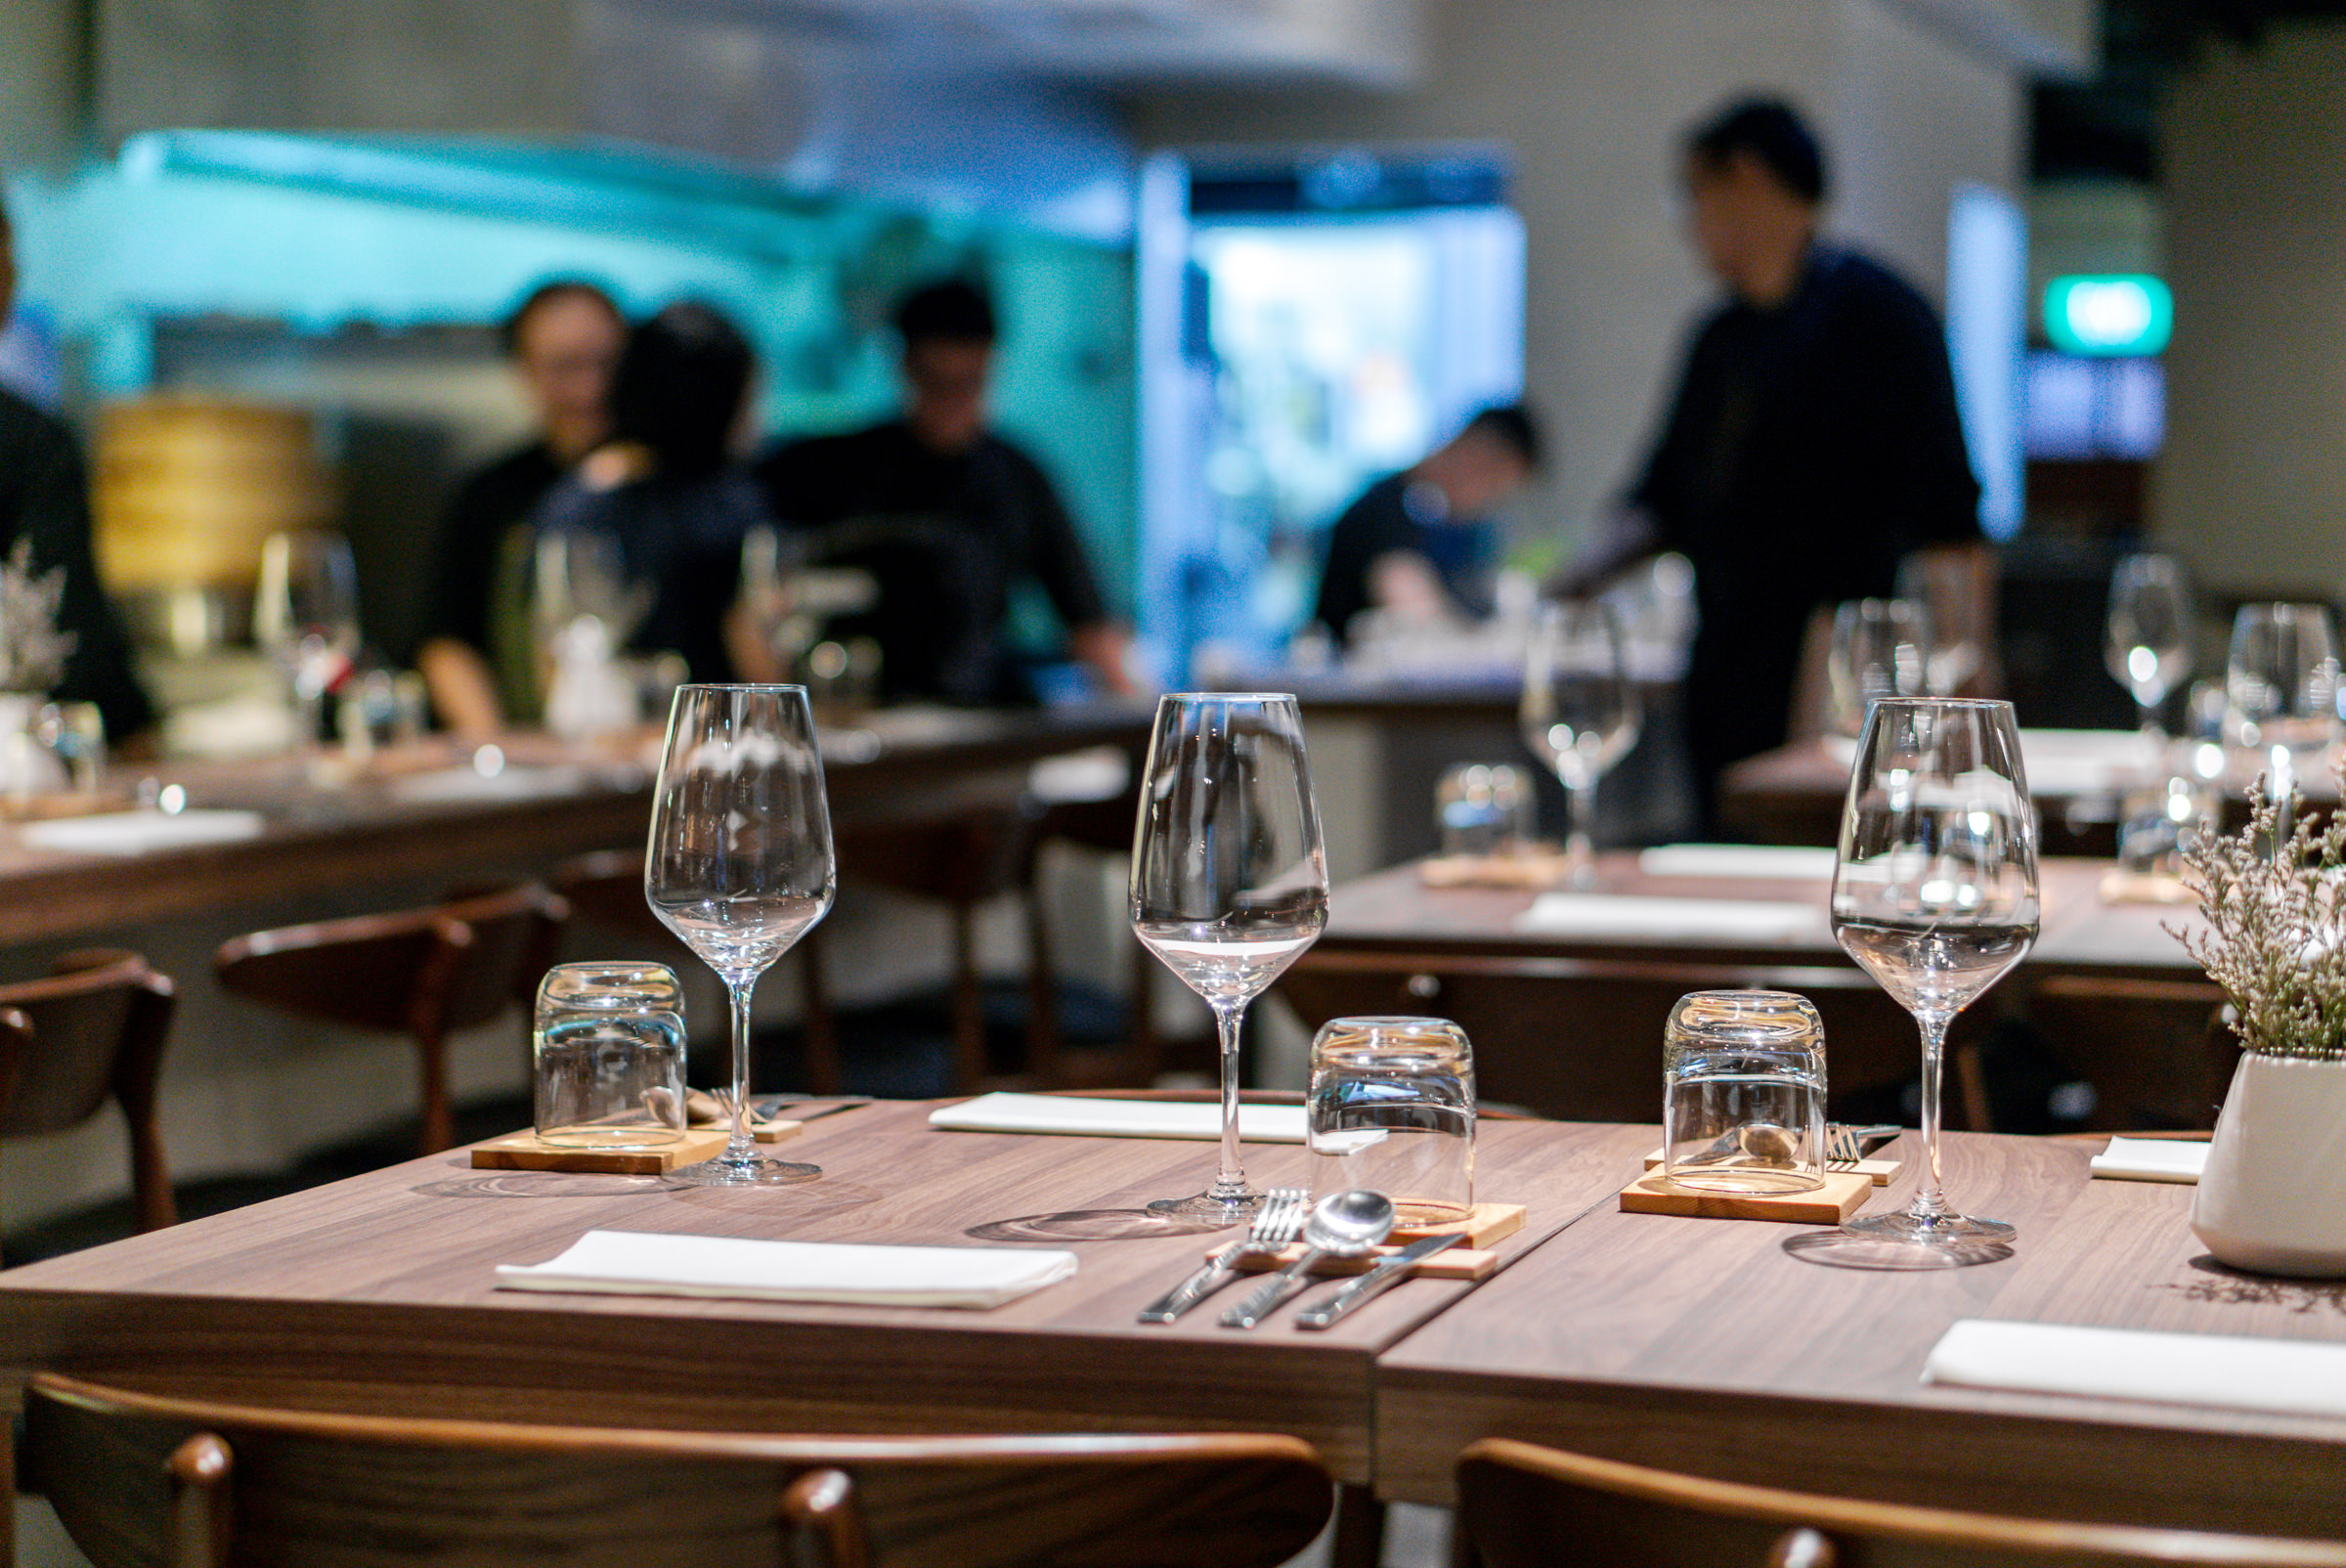 Restaurant-Ibid-Woo-Wai-Leong-Interiors-1.jpg